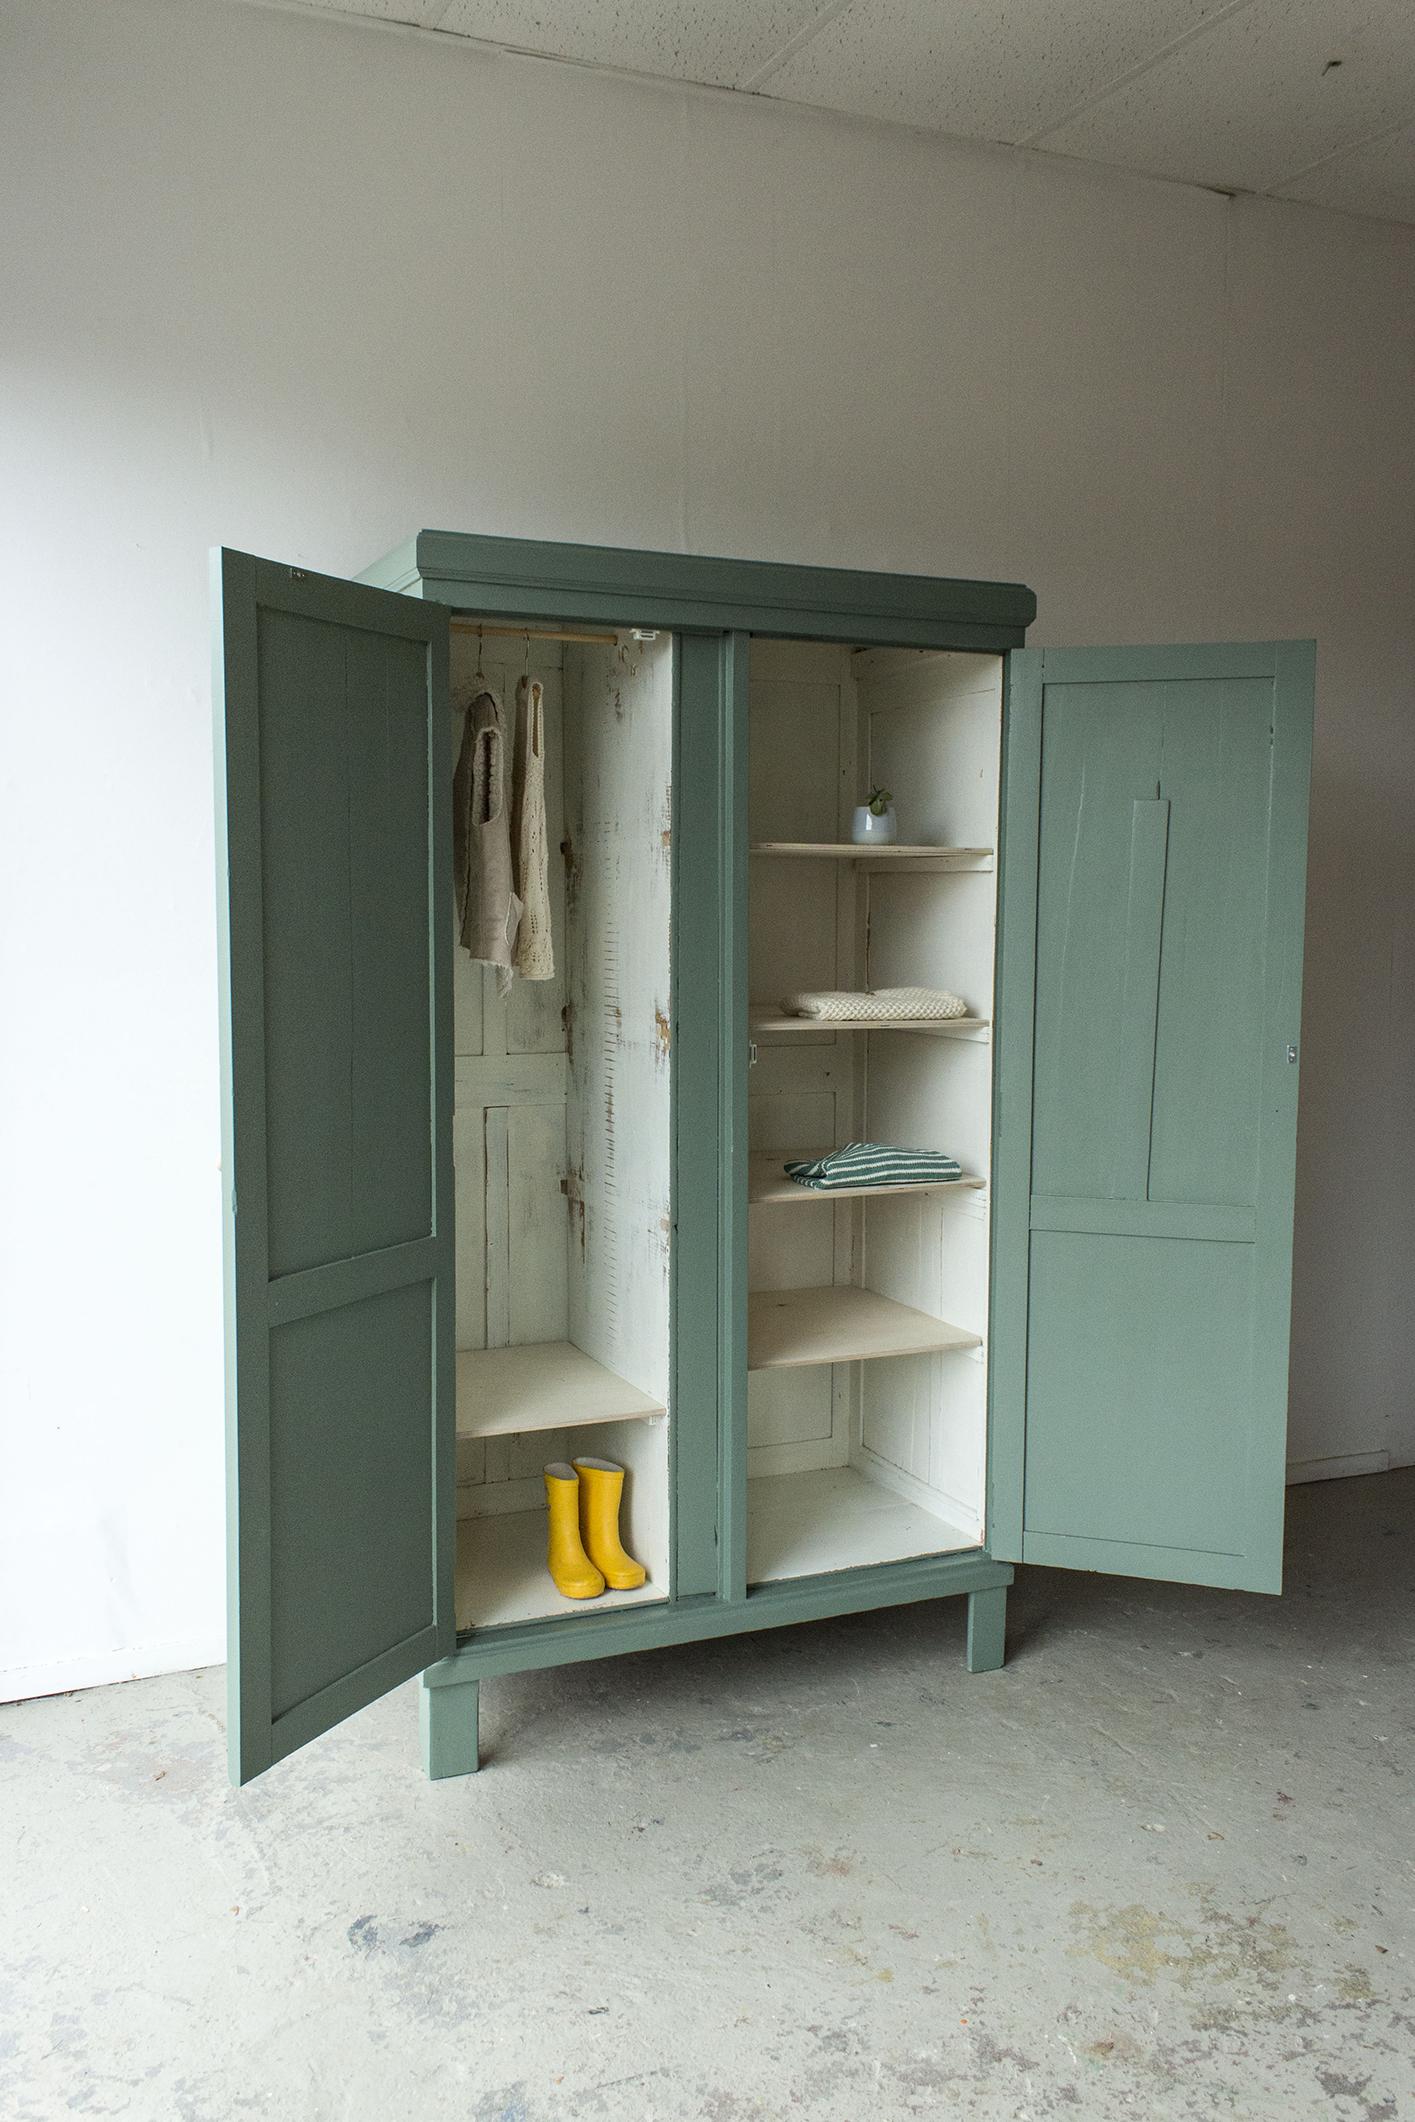 _Dennengroene vintage kledingkast -  Firma zoethout_4.jpg